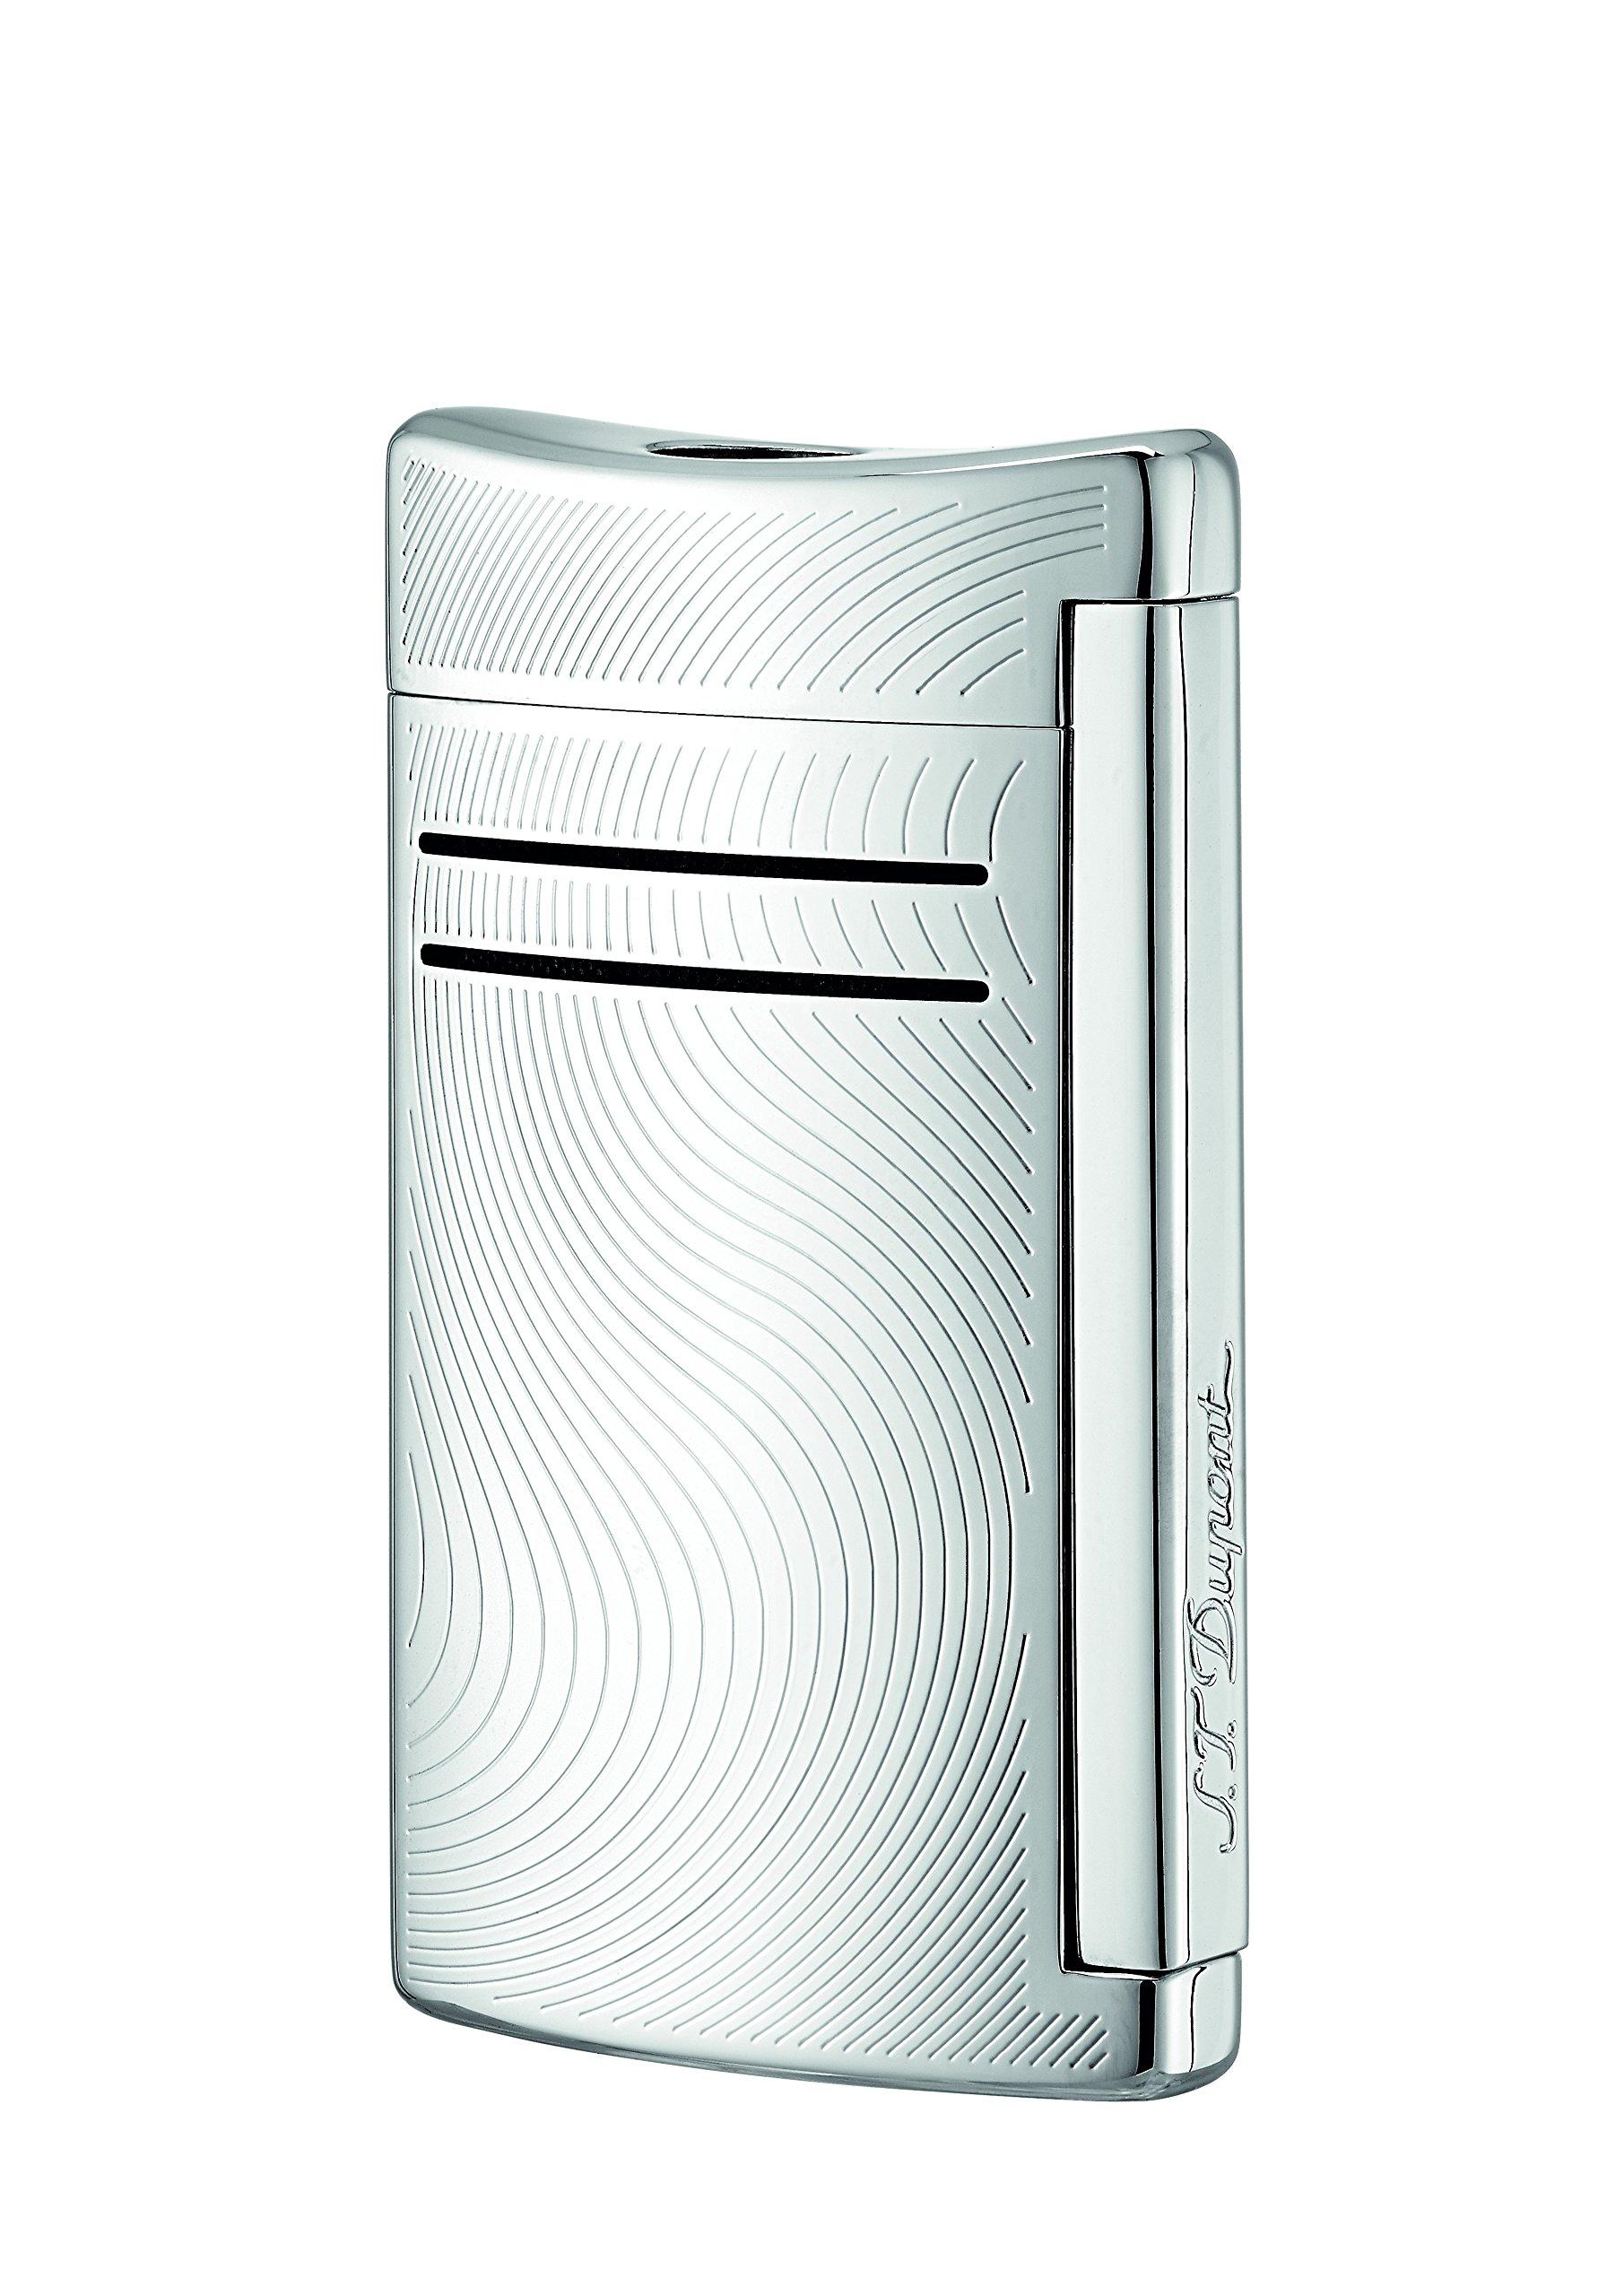 S.T. Dupont Maxijet Chrome Waves Cigar Jet Lighter / 020163N by S.T. Dupont (Image #1)